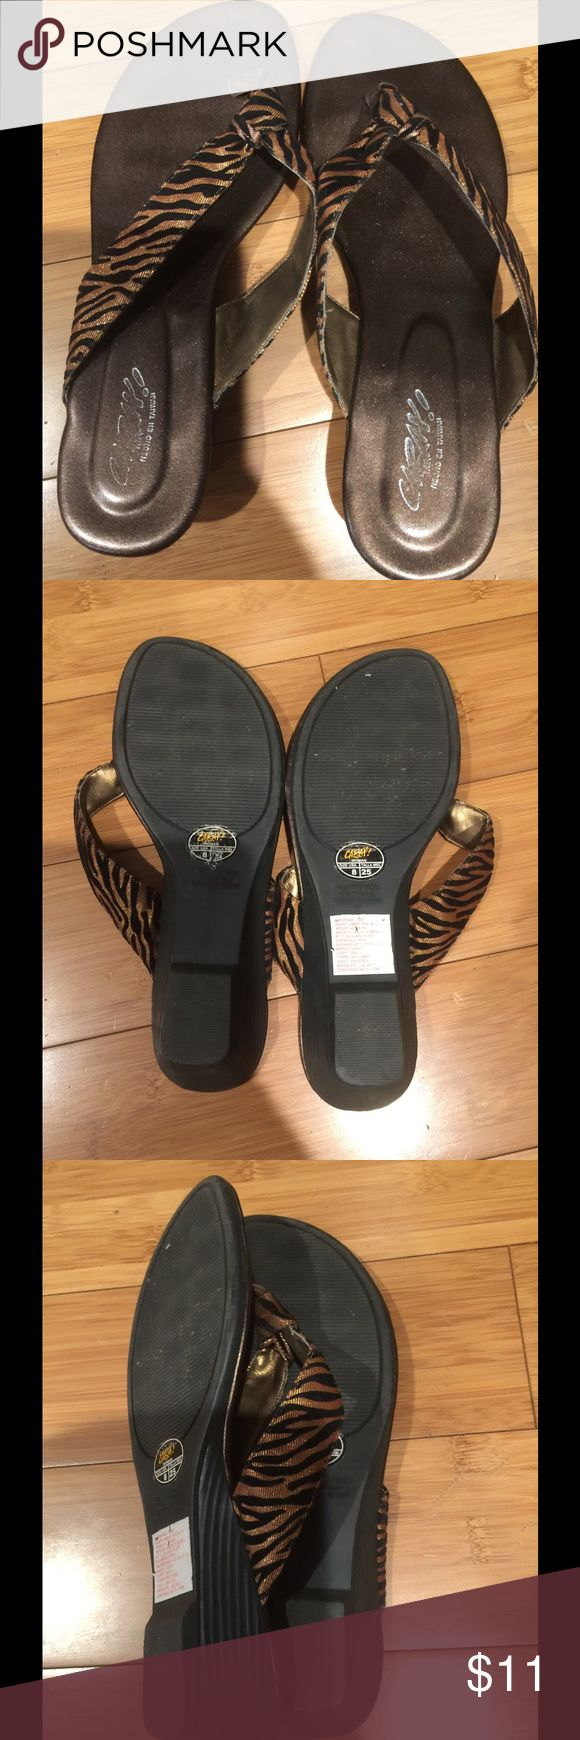 Caray size 8 flip flops Caray flip flops size 8 wedge heels caray Shoes